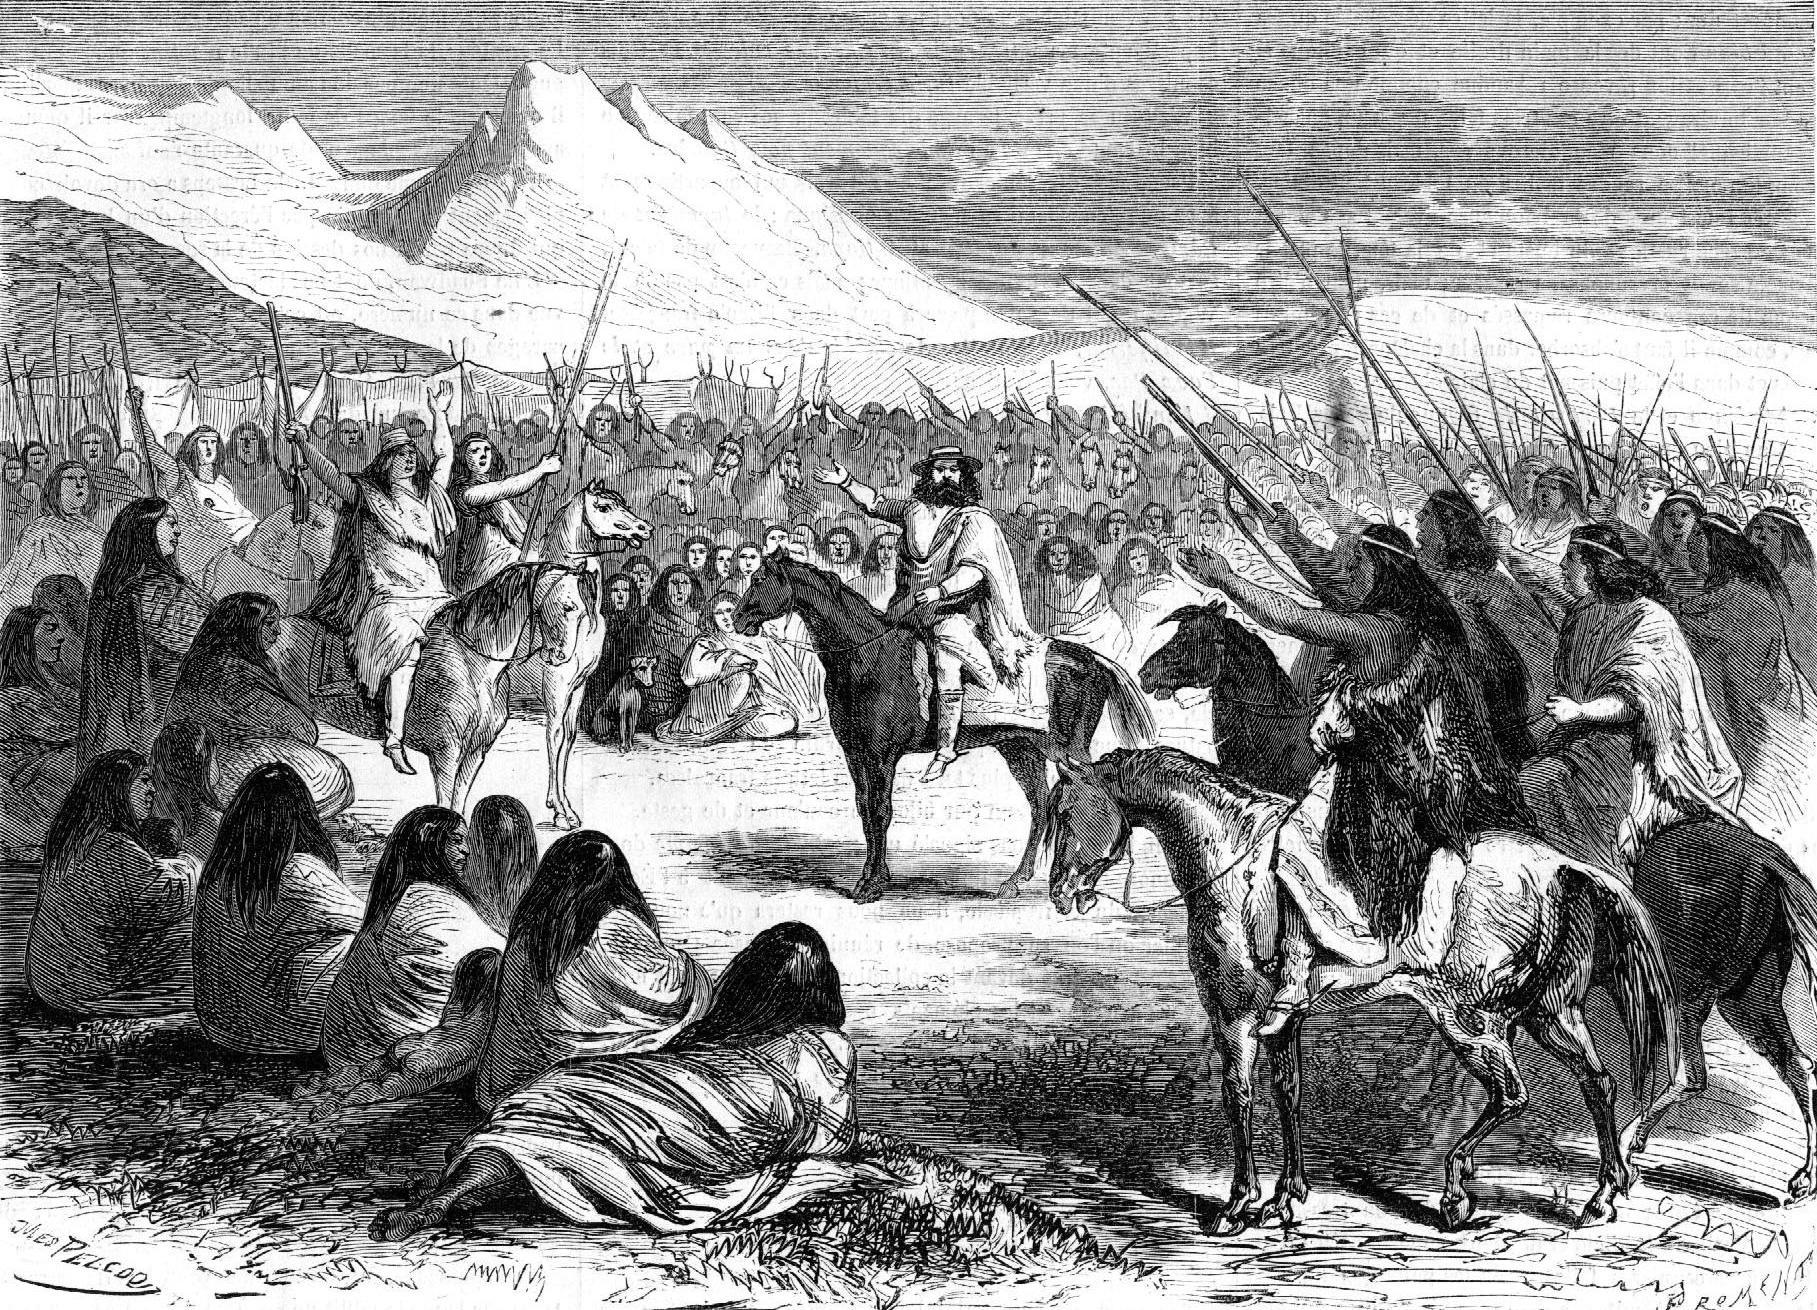 Reunión de indios Mapuches, propios del sur de Chile. Autor, Jules Peco (siglo XIX)